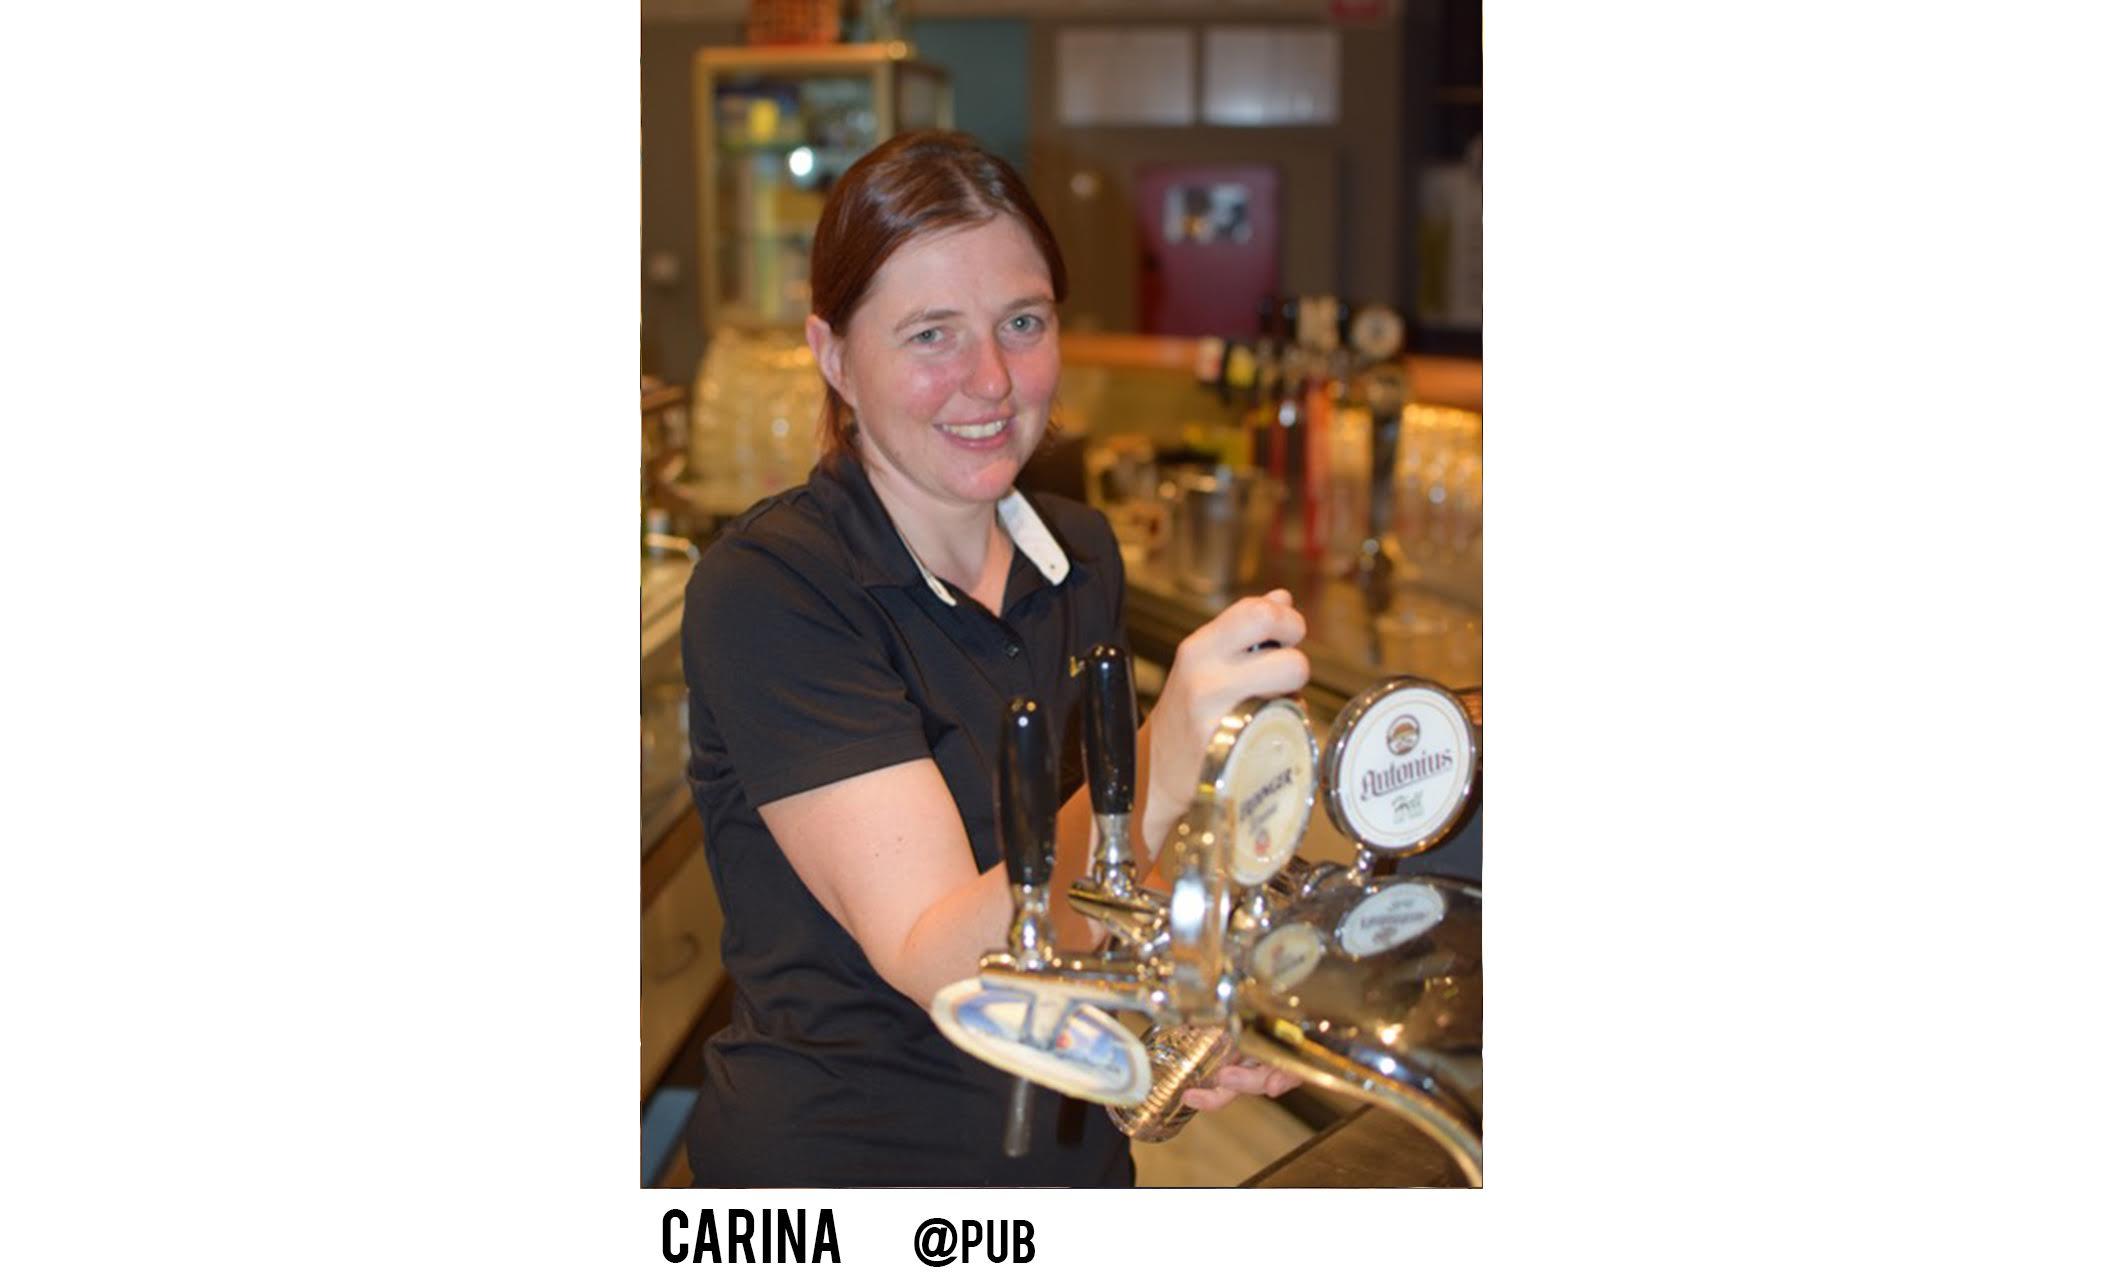 carina-pub